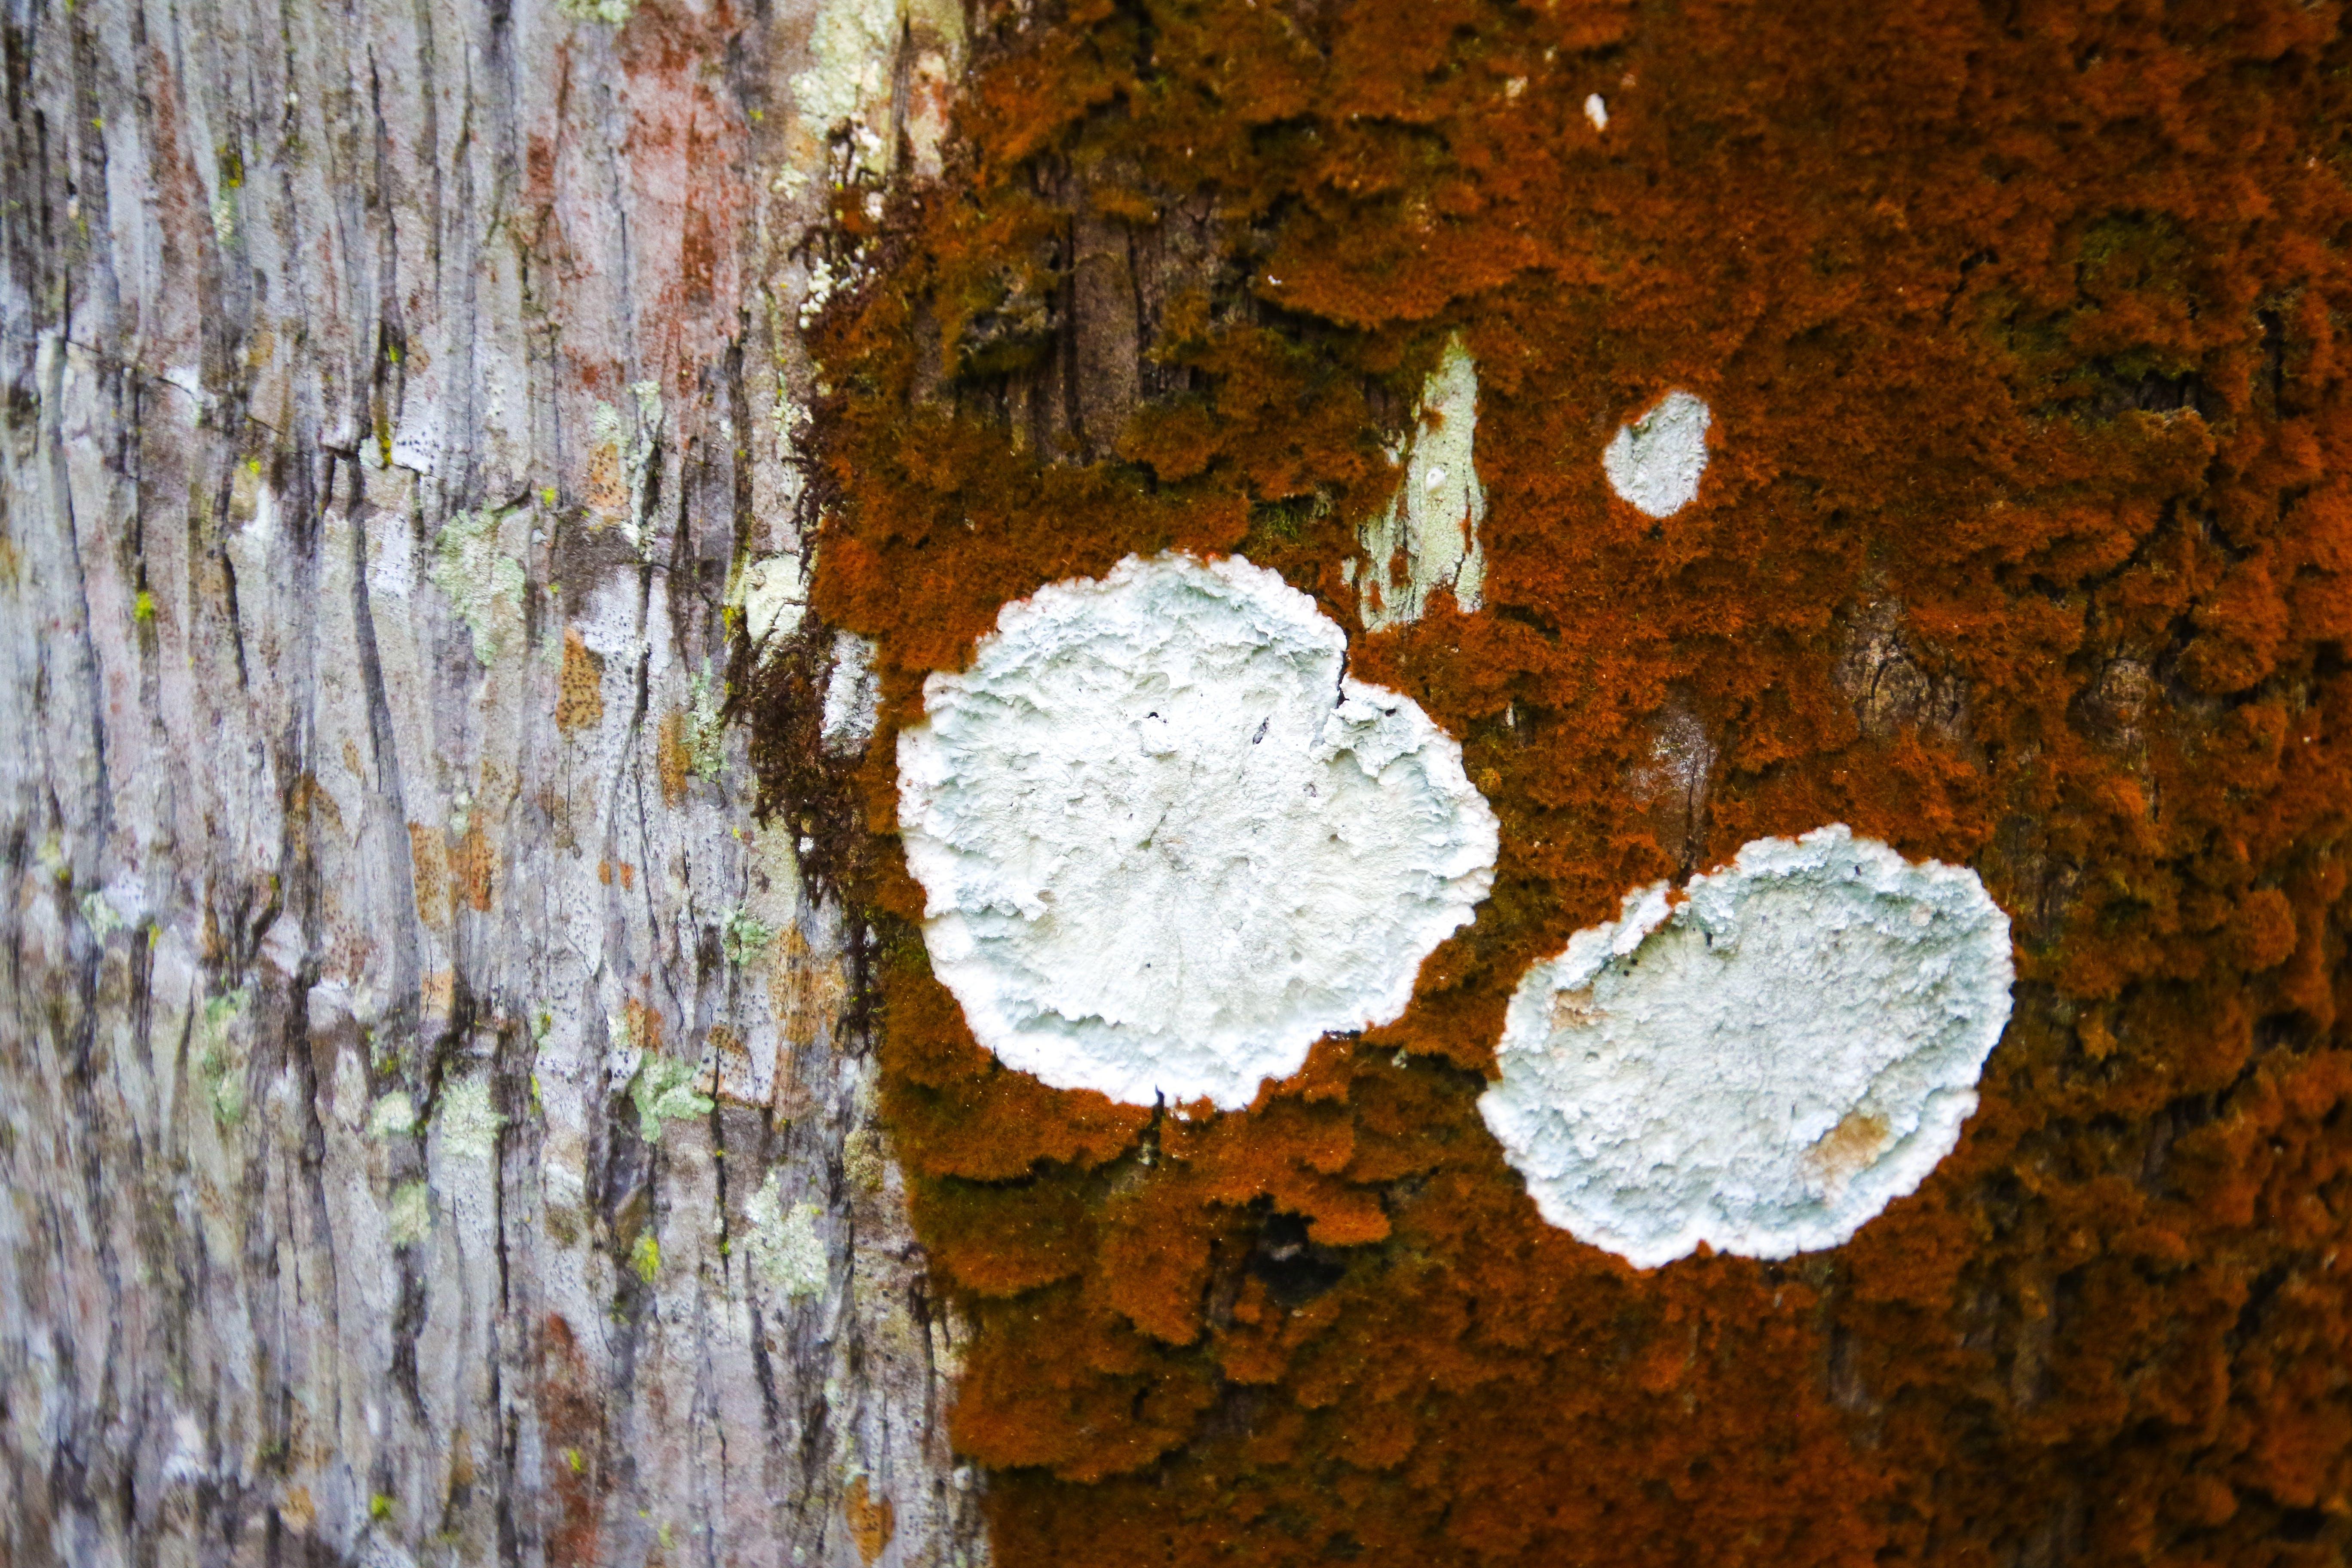 Free stock photo of nature, texture, garden, moss